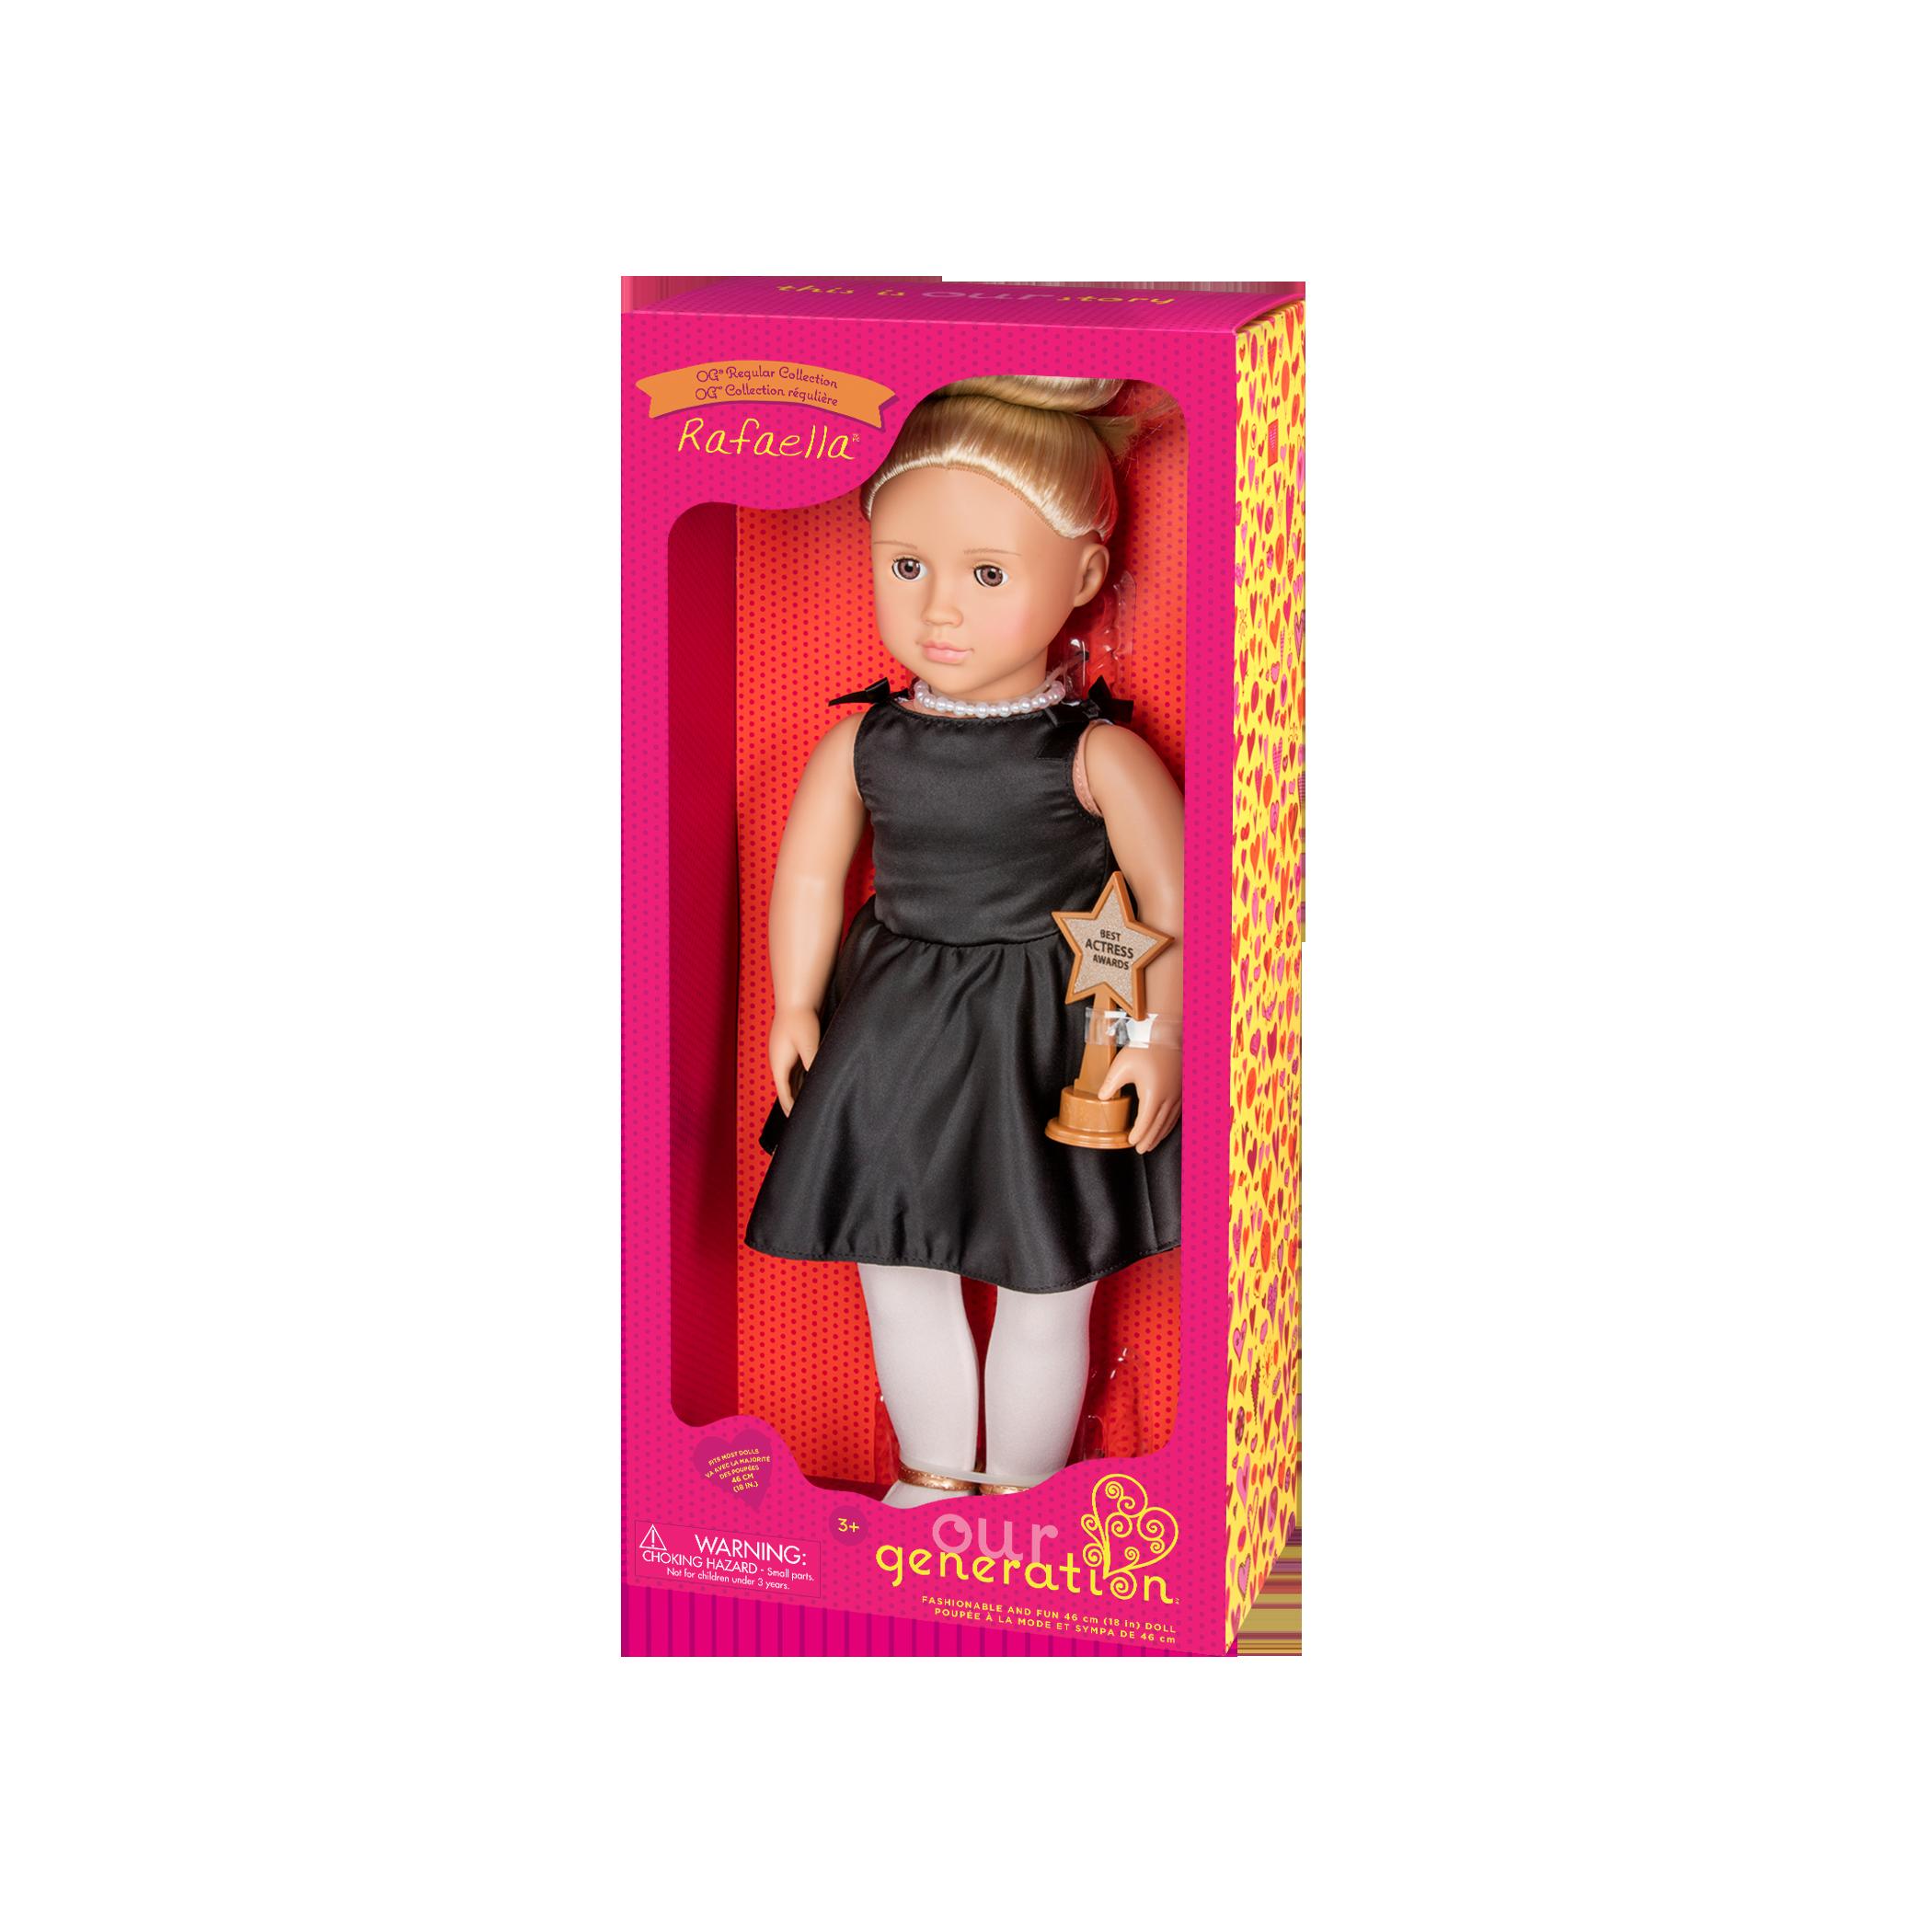 Rafaella Regular 18-inch Actress Doll in packaging